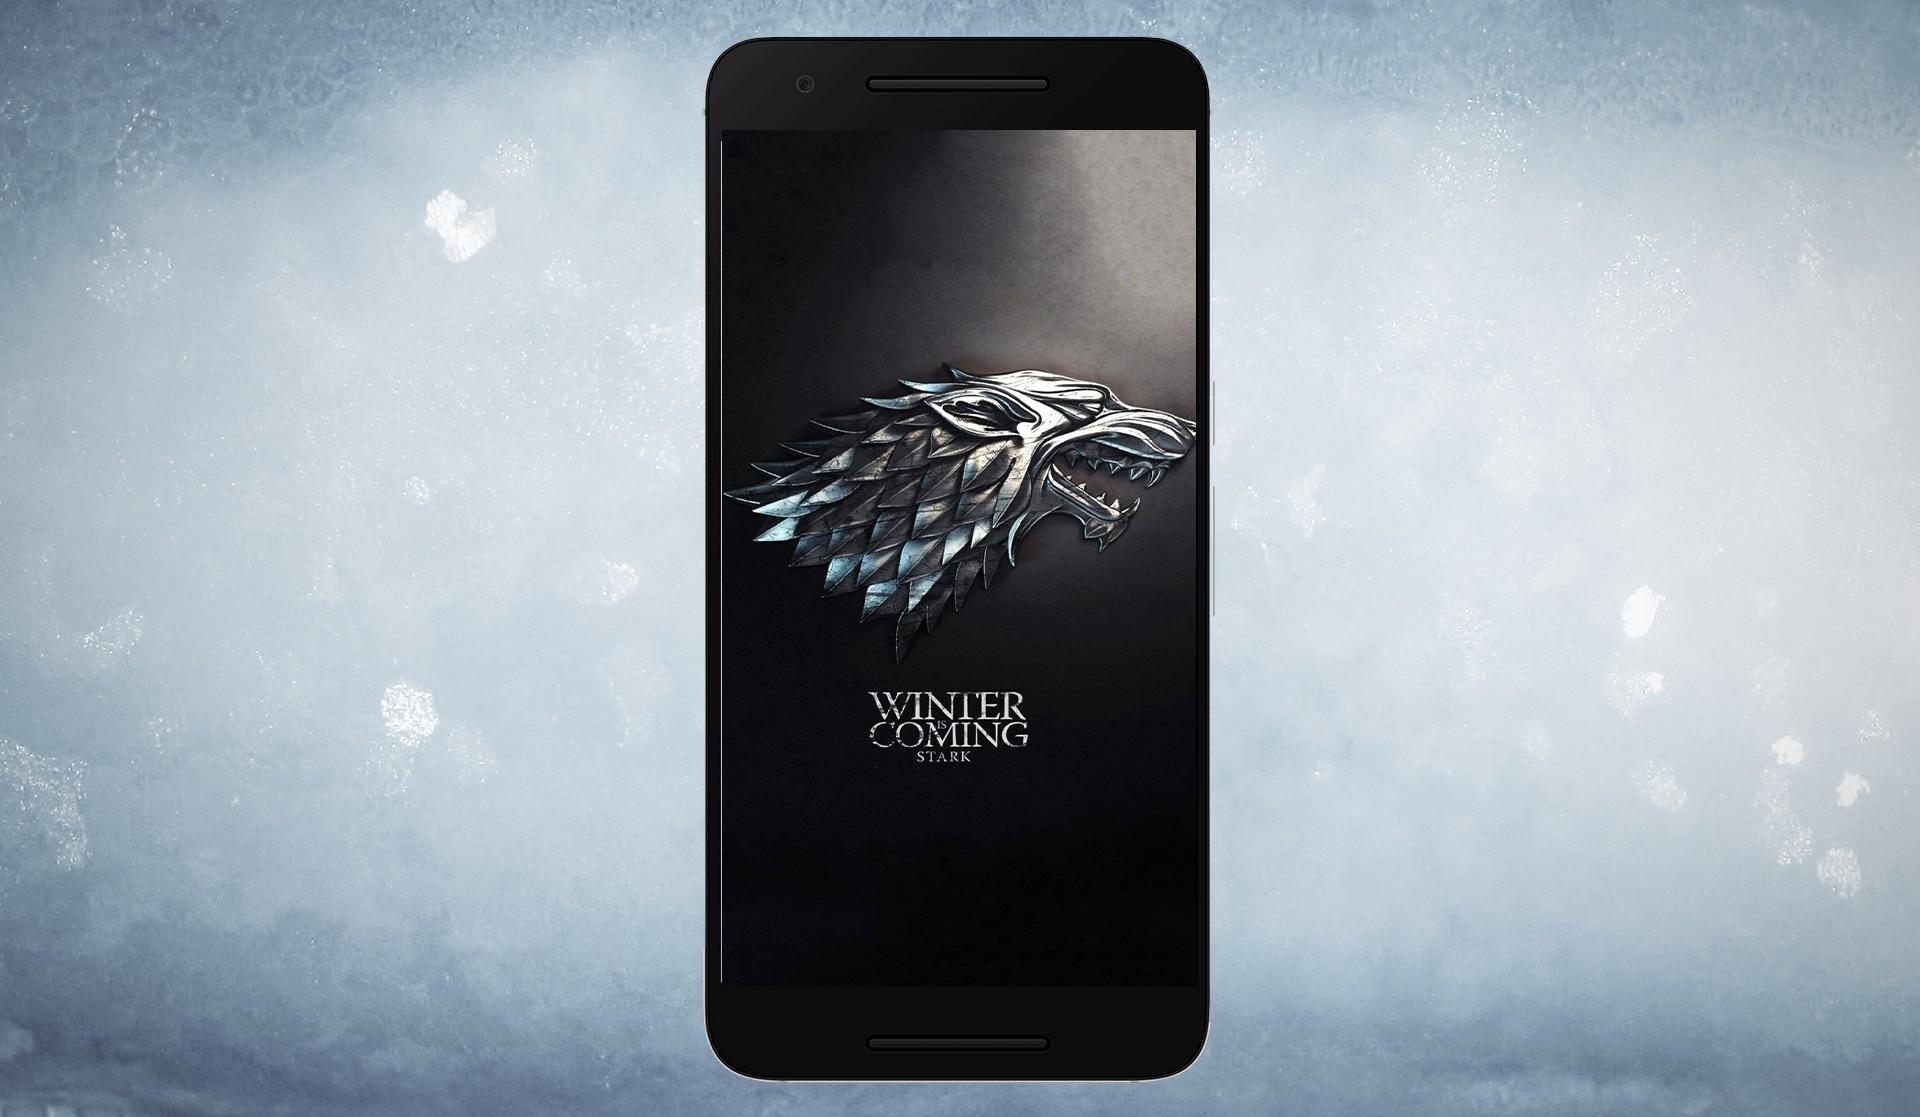 Winter Is Coming Wallpaper Pour Android Telechargez L Apk